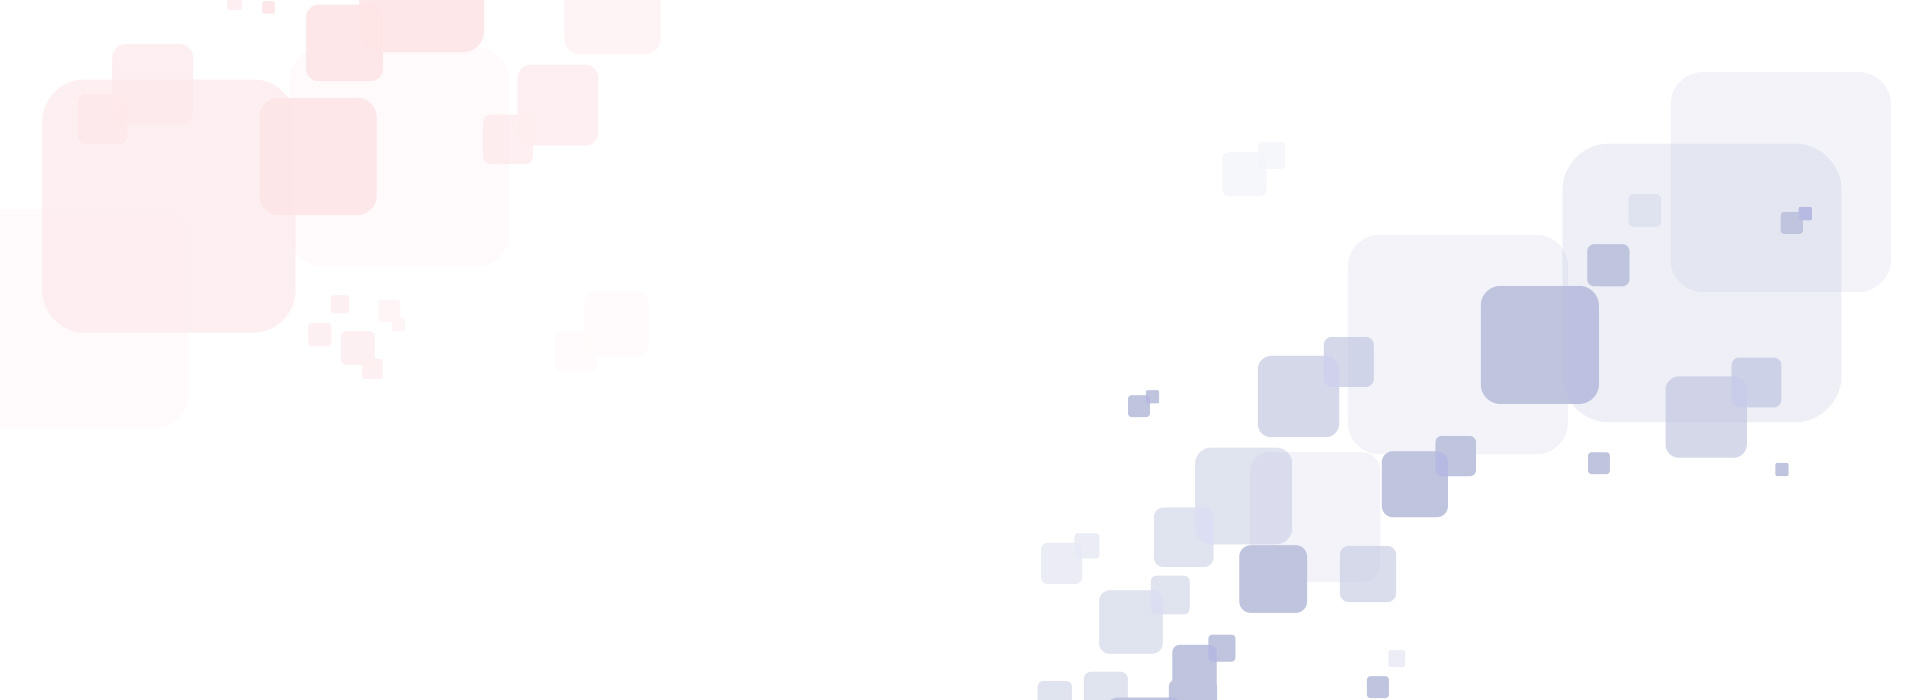 venta de bolsa de plástico, venta de bolsas de plástico en México, venta de bolsa en rollo, venta de bolsa plana, venta de bolsa en película, venta de bolsa especial, proveedor de bolsa, proveedor de polietileno, venta de bolsa de polietlileno, venta bolsa alta densidad, bolsa baja densidad, venta de bolsa baja densidad, bag to bag, grupo laposa, bolsa de polietlileno, bolsa alta densidad, bolsa natural